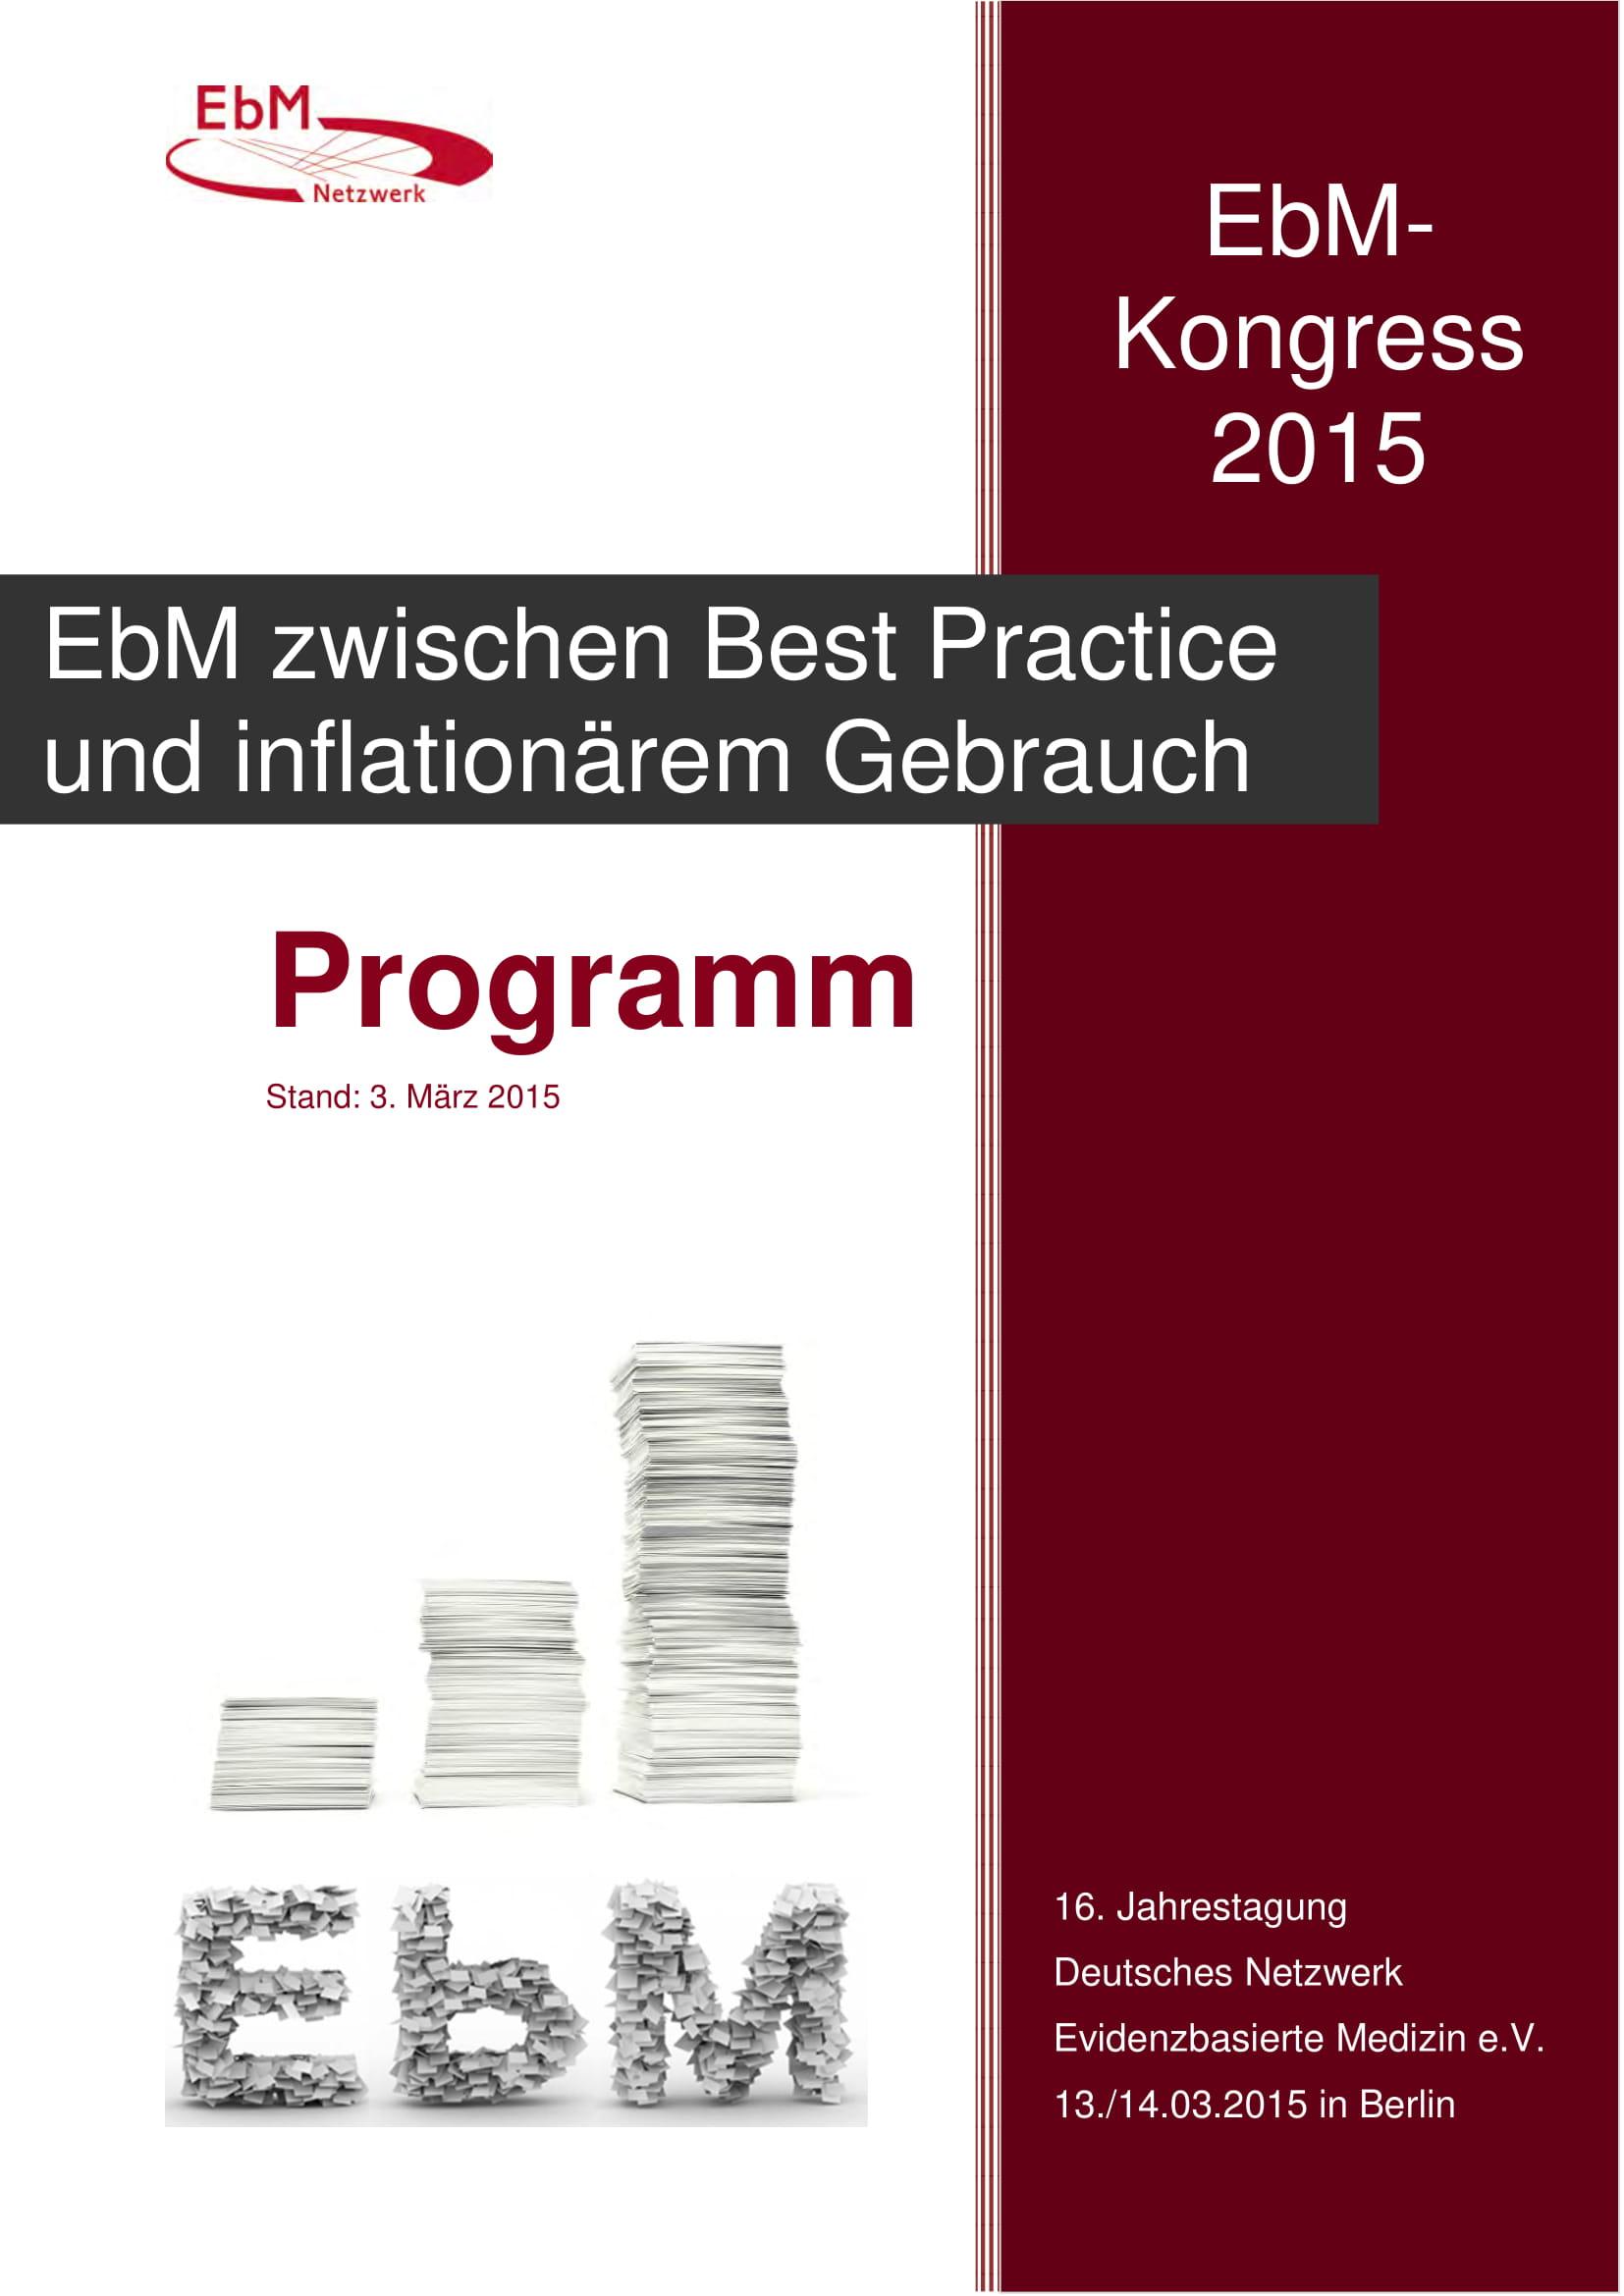 EbM2015-Programmheft-Deckblatt.jpg